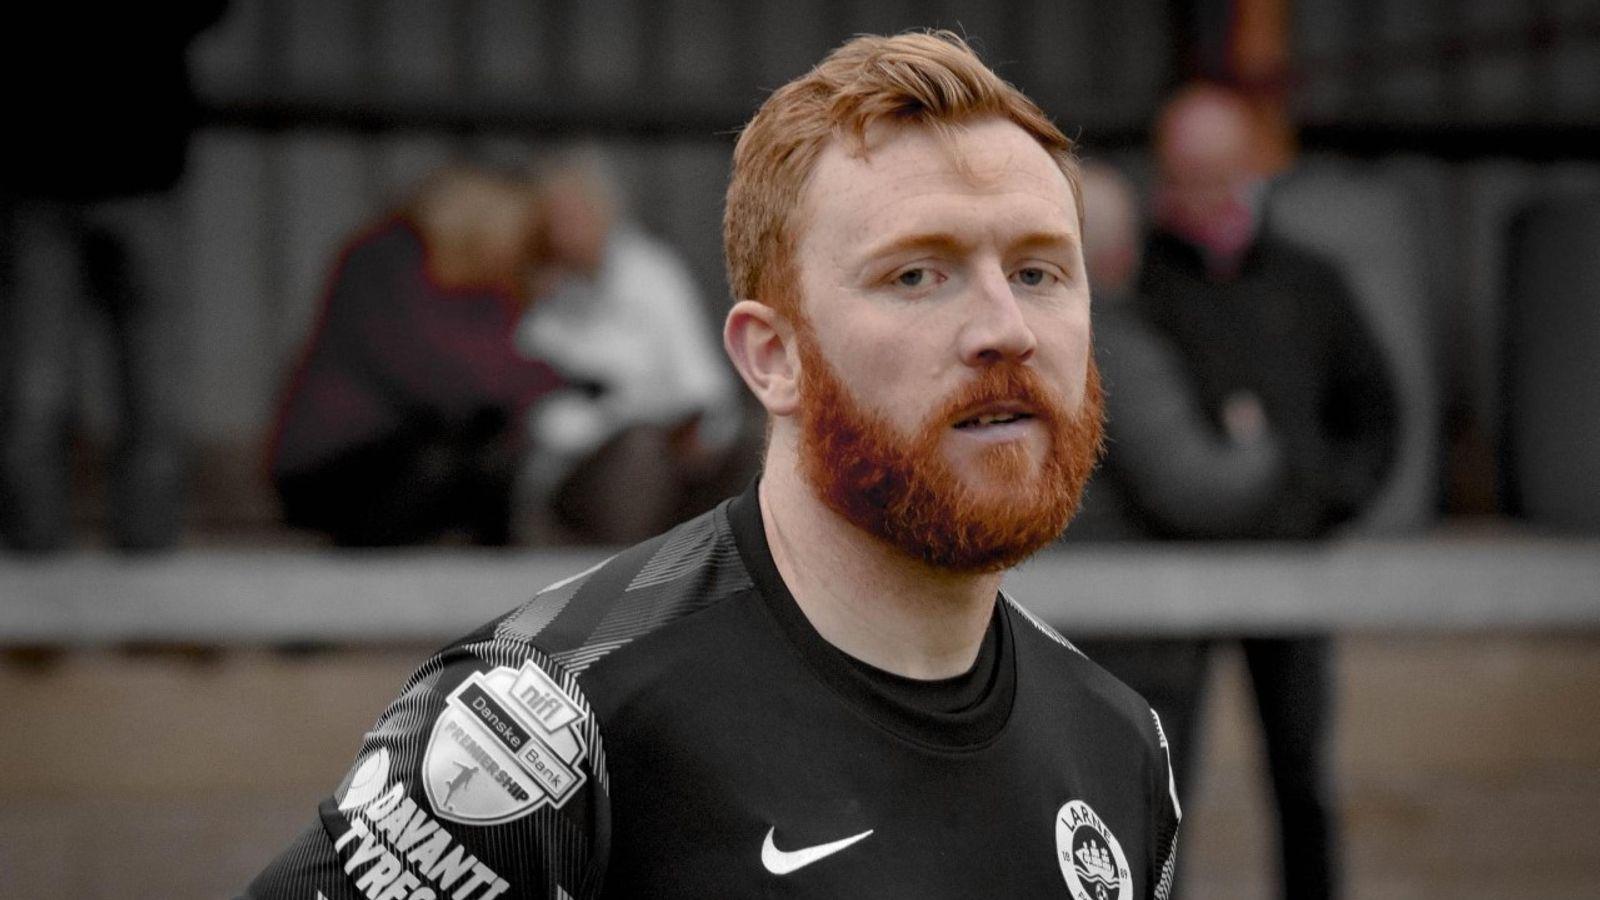 Former Man Utd 'keeper Devlin admires Ole's 'ruthless streak'